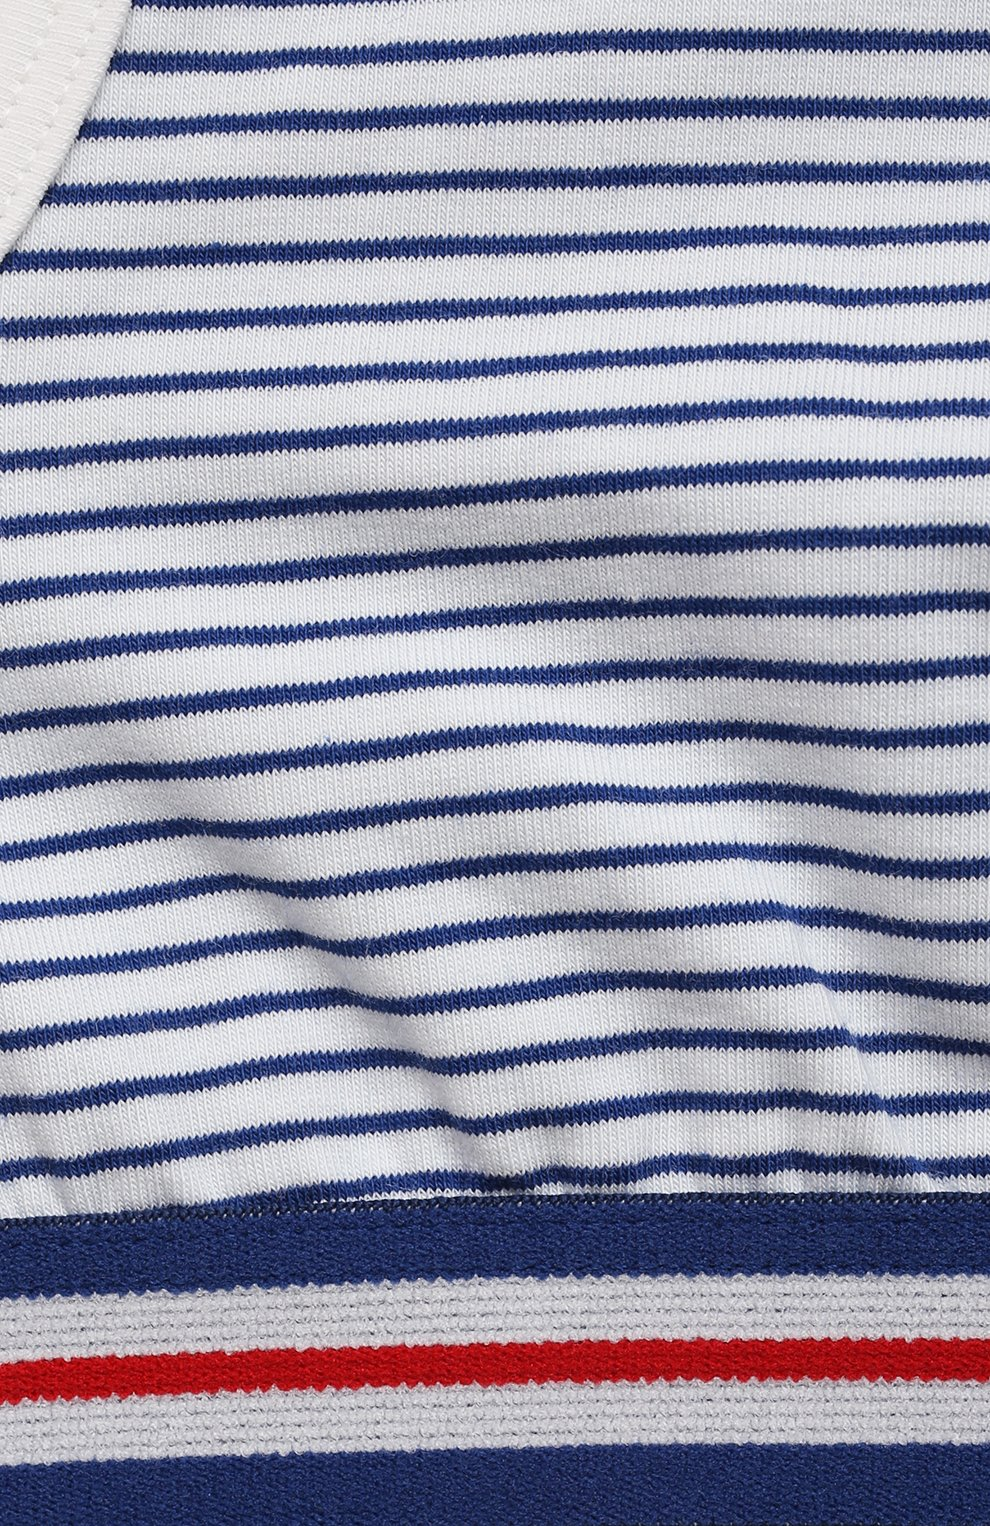 Детский бра-топ SANETTA синего цвета, арт. 346704 | Фото 3